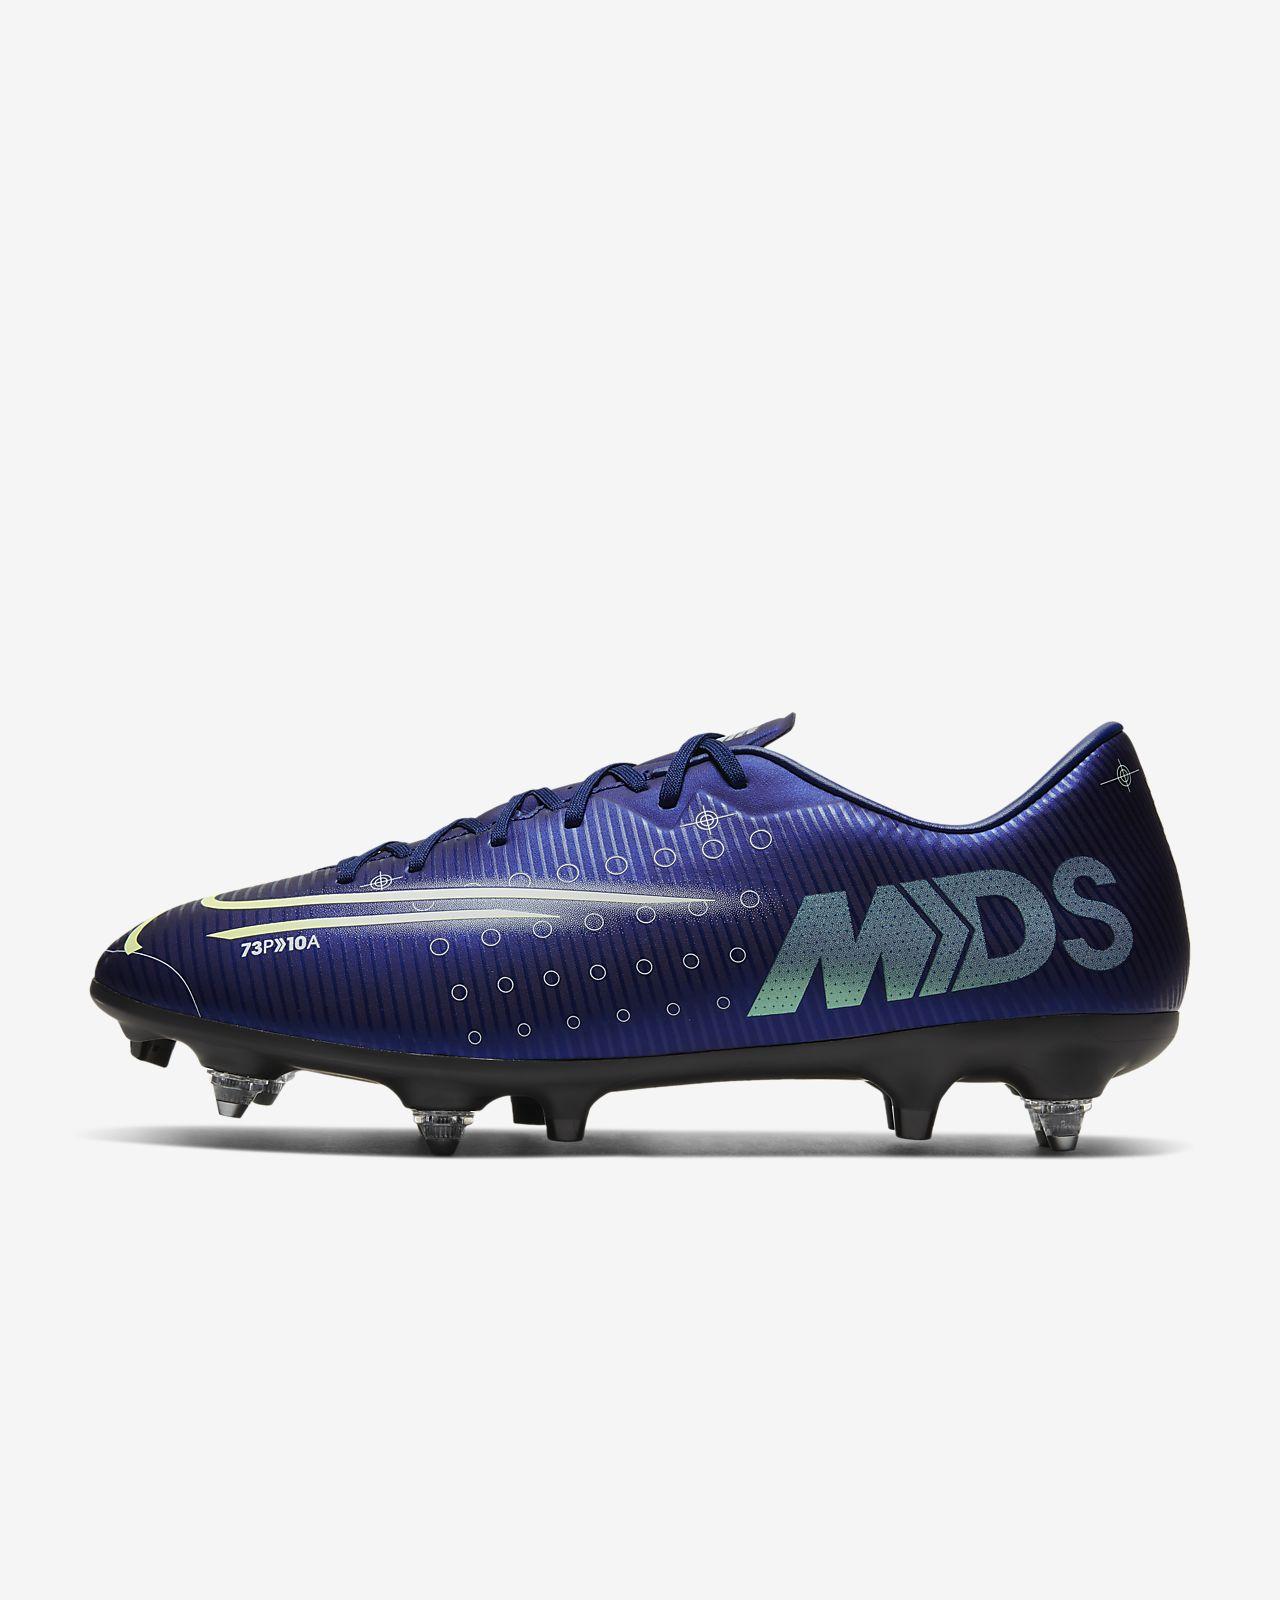 Calzado de fútbol para terreno blando Nike Mercurial Vapor 13 Academy MDS SG-PRO Anti-Clog Traction